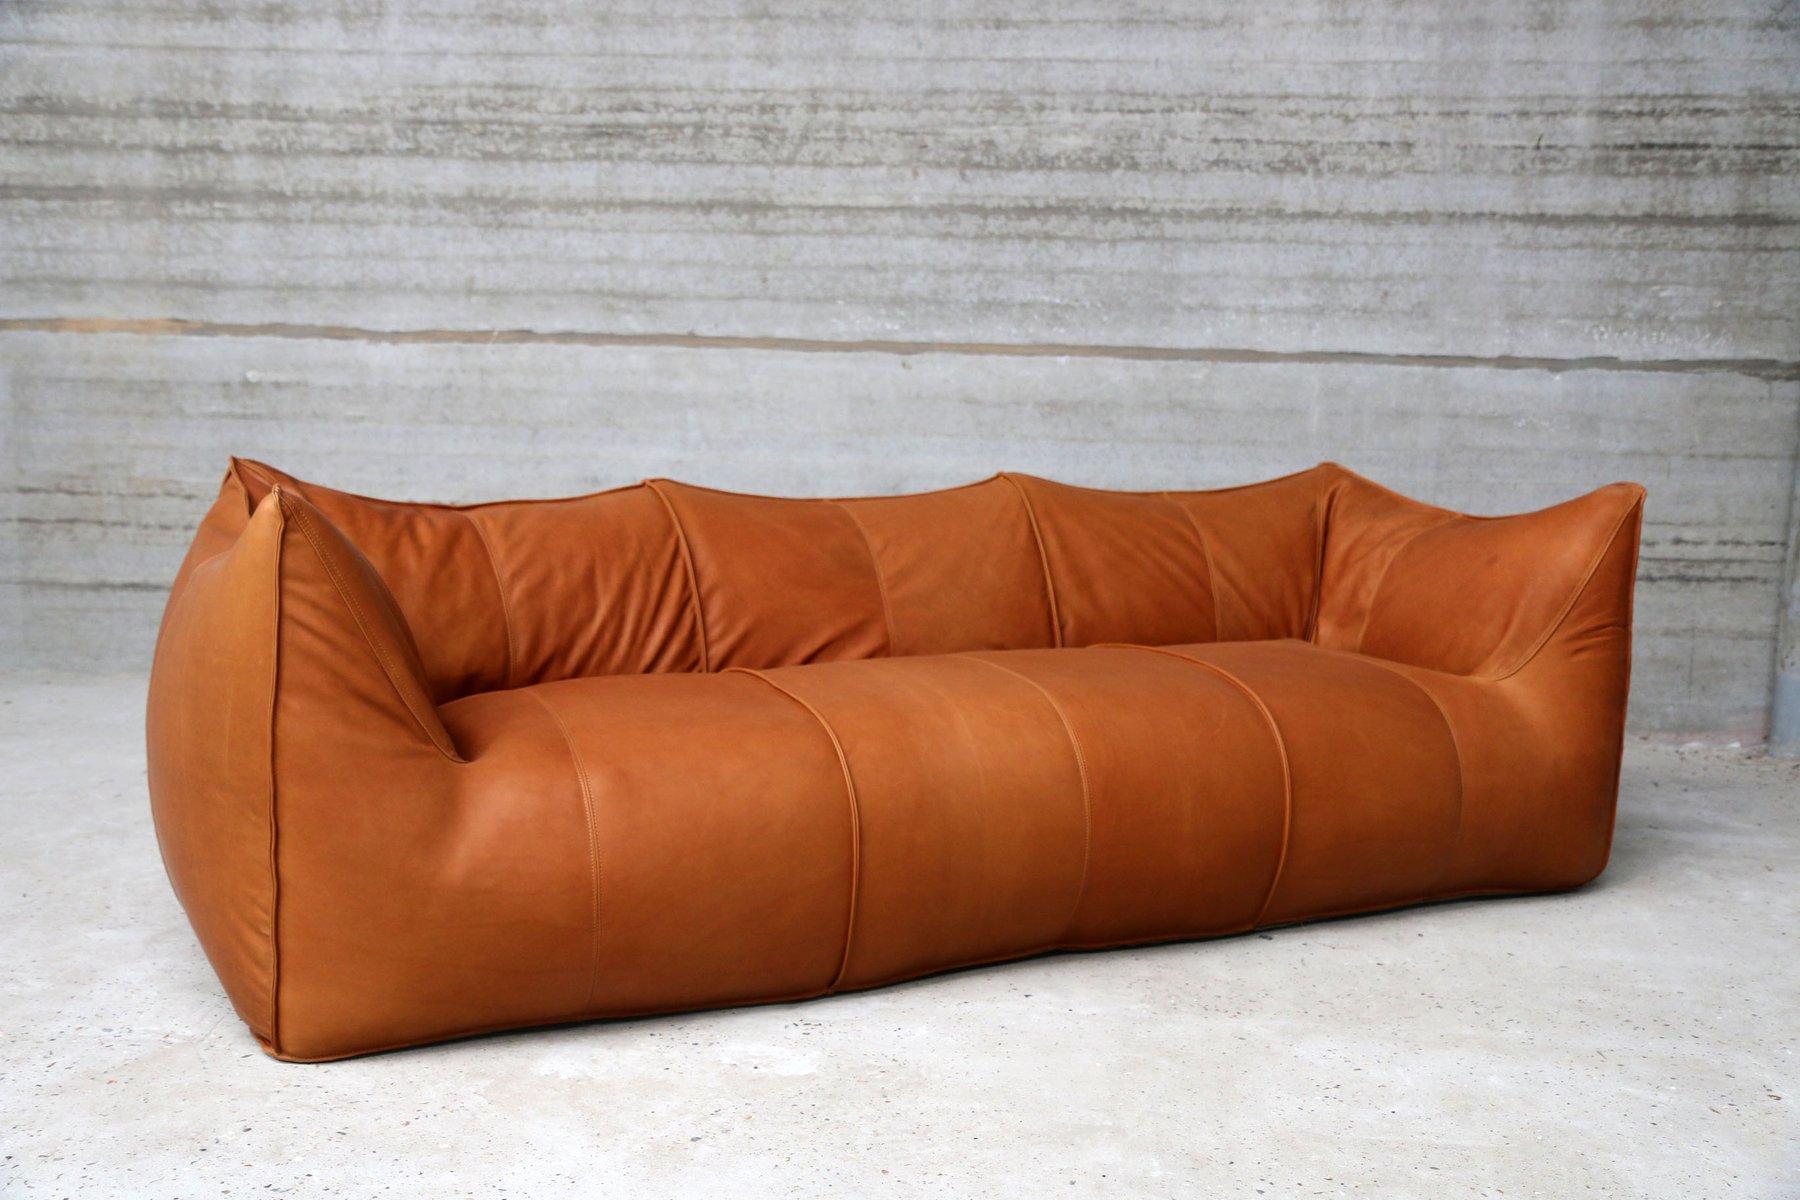 Vintage Le Bambole Three Seater Sofa By Mario Bellini For B Italia